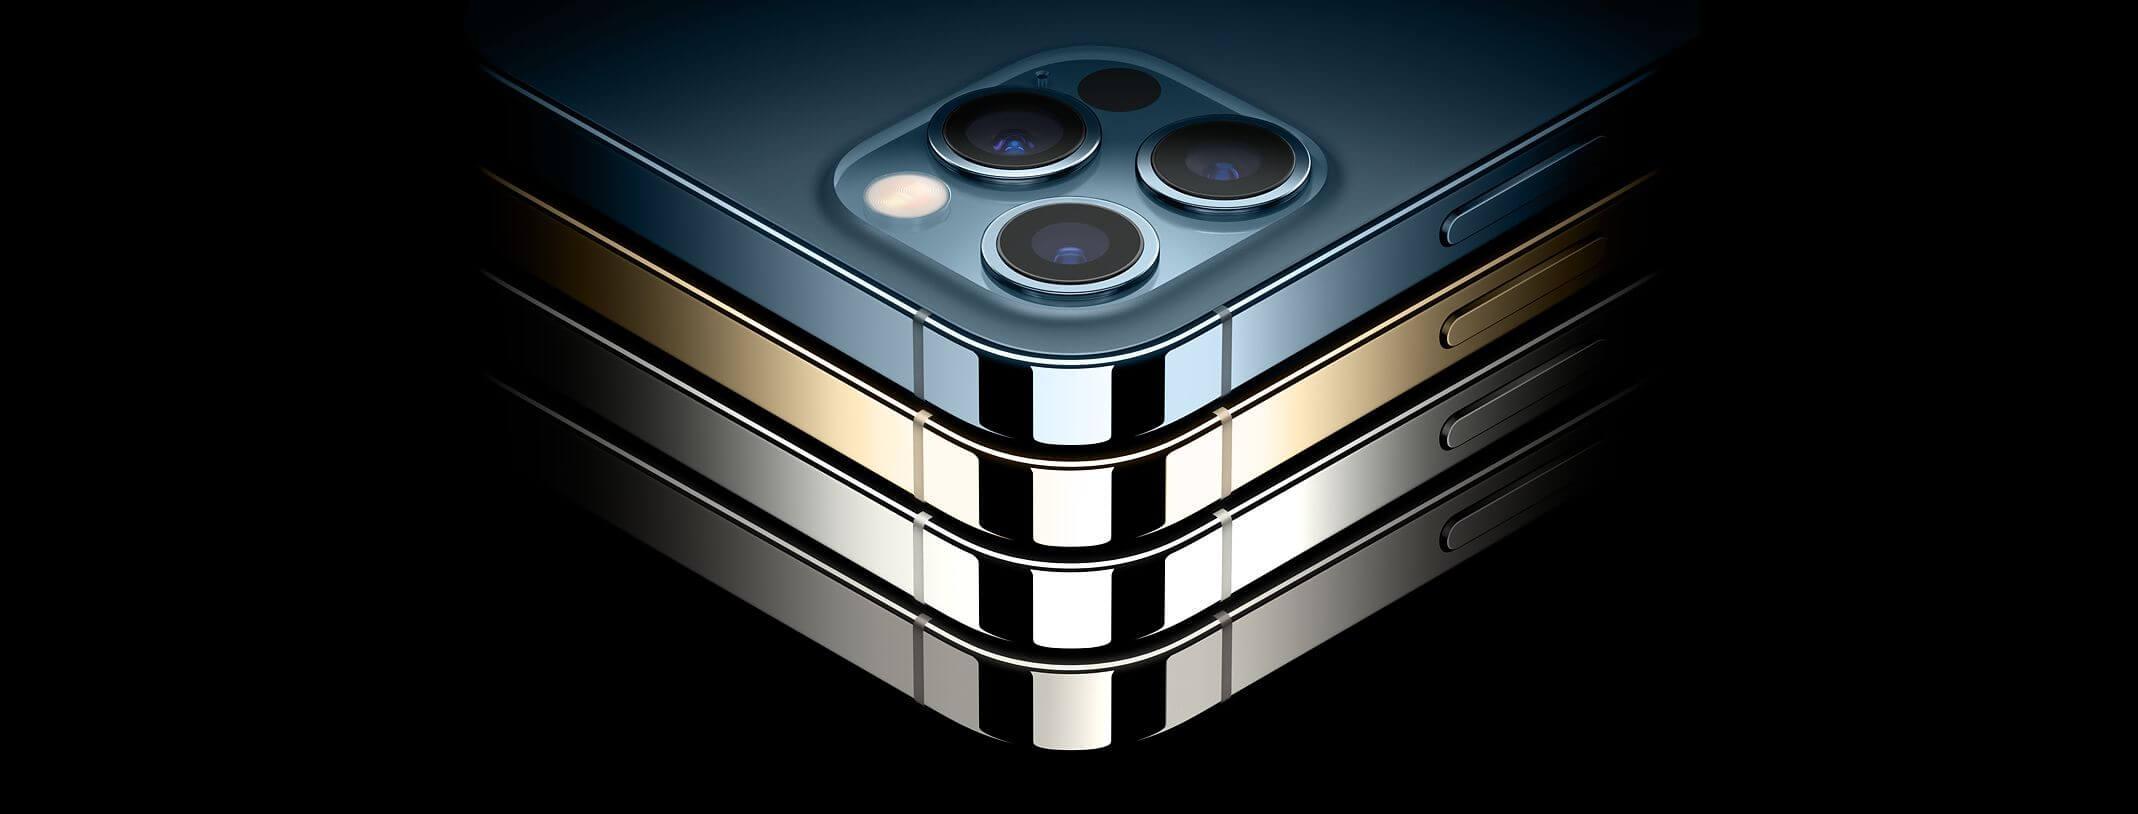 iphone-12-pro-gallery-3